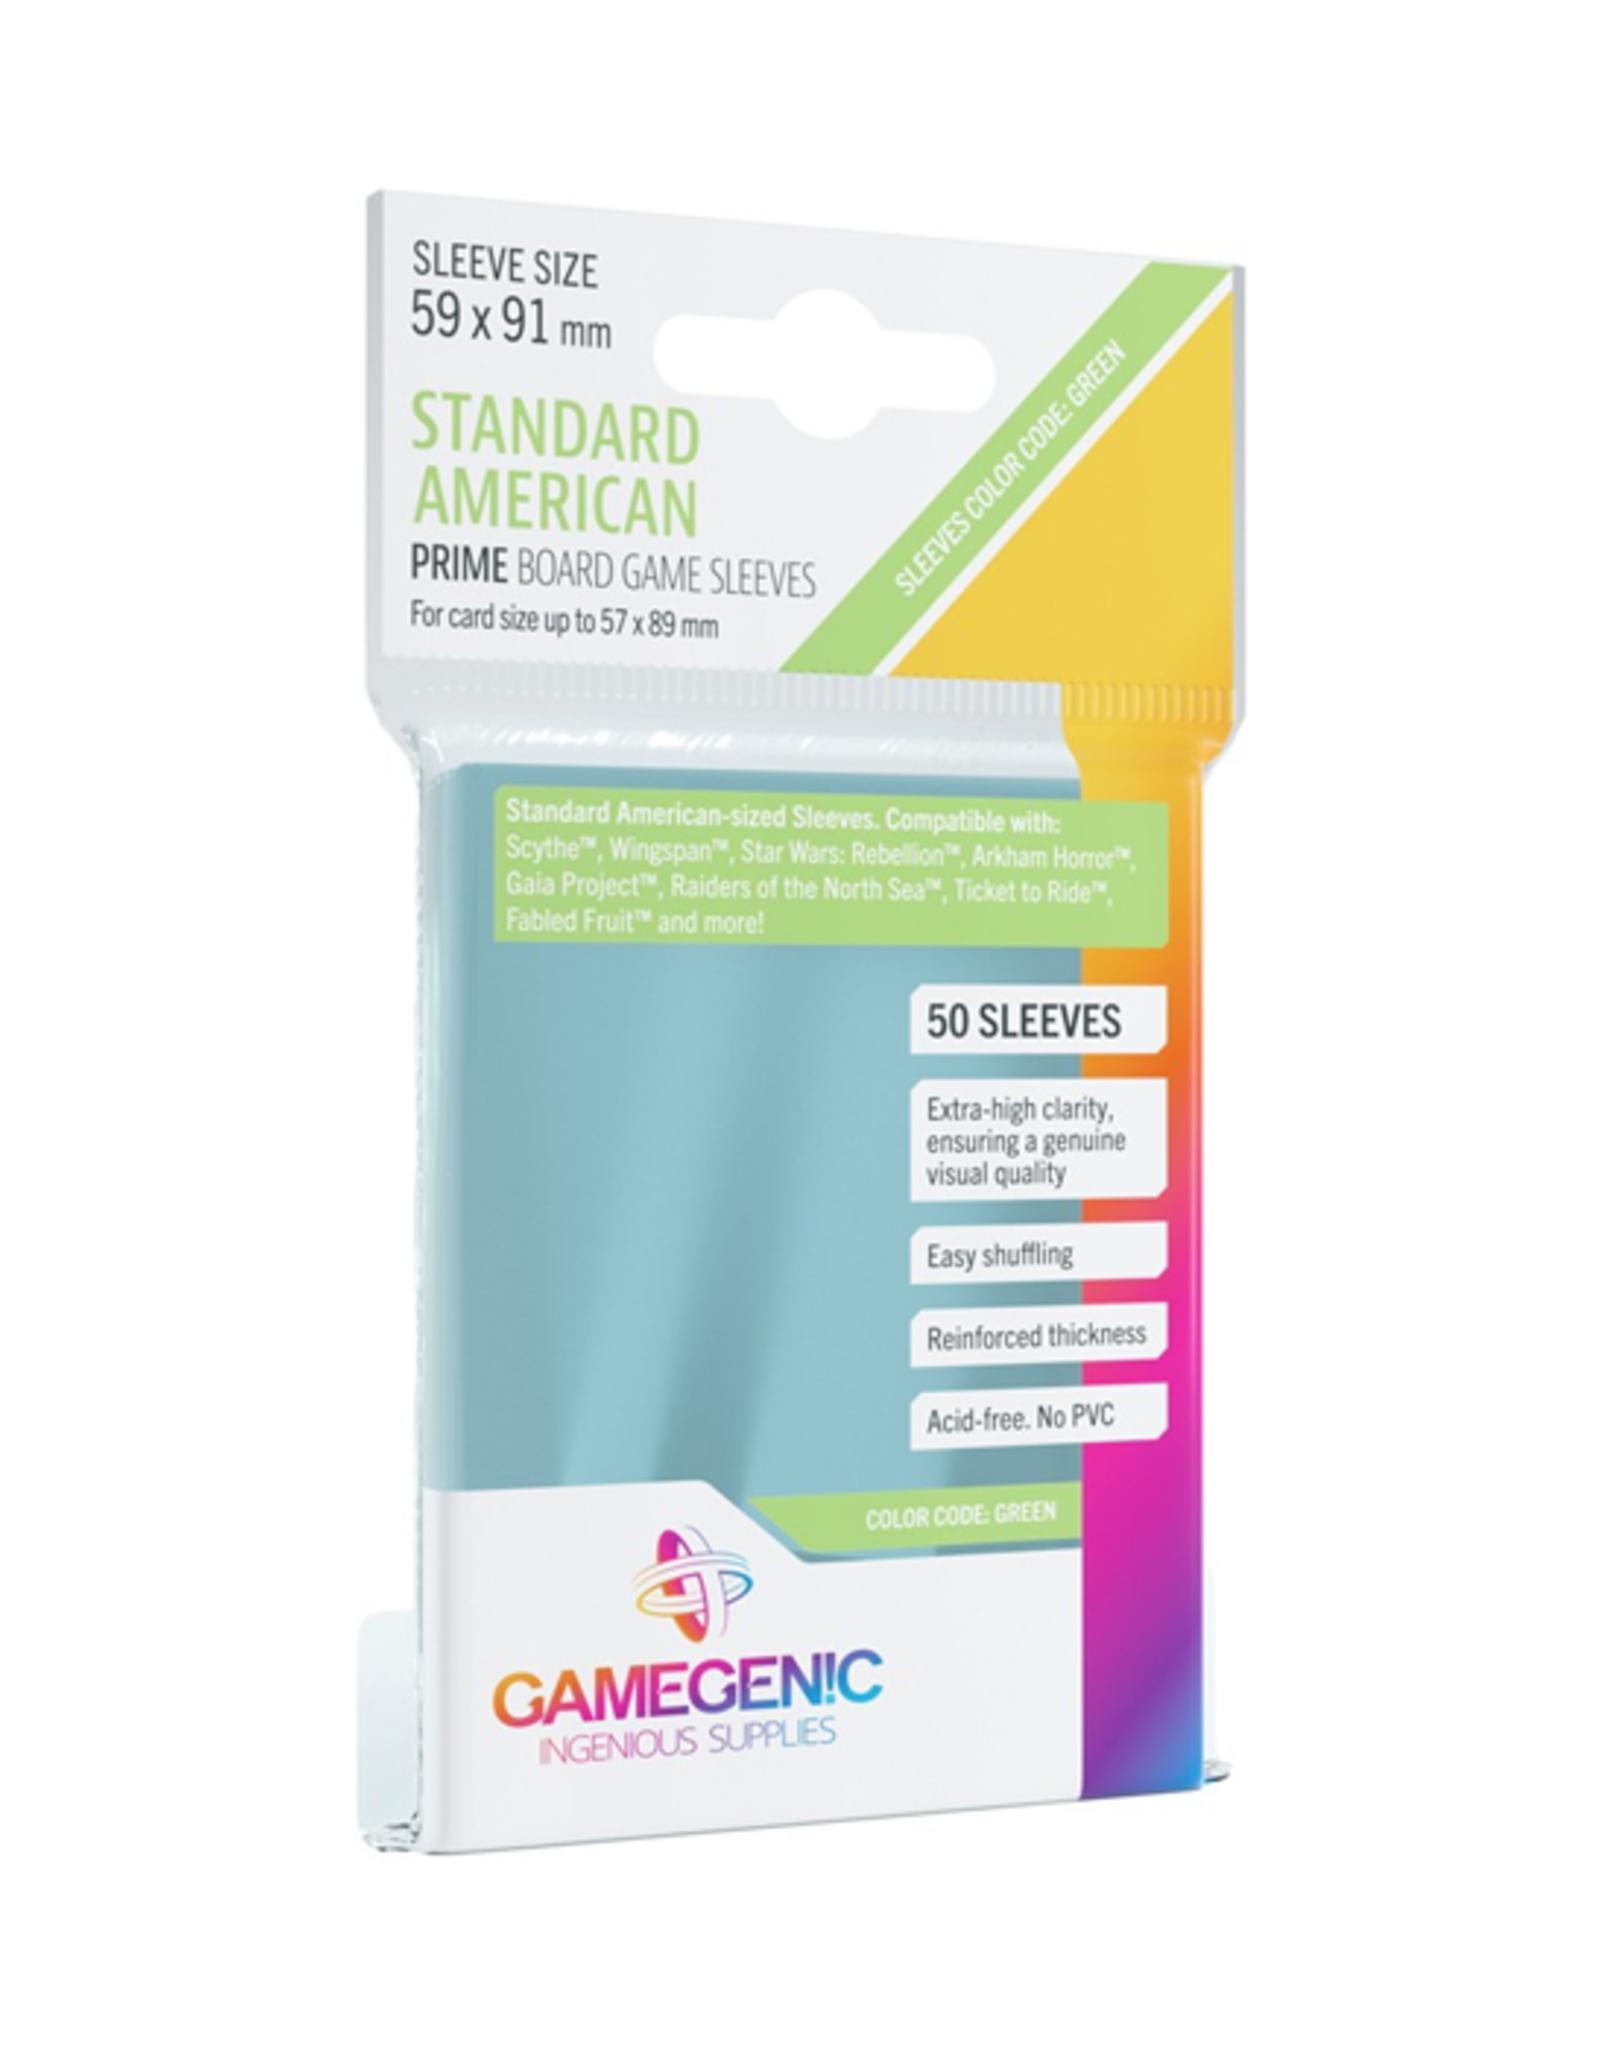 Gamegenic Gamegenic: Sleeves - Board Game - Standard American